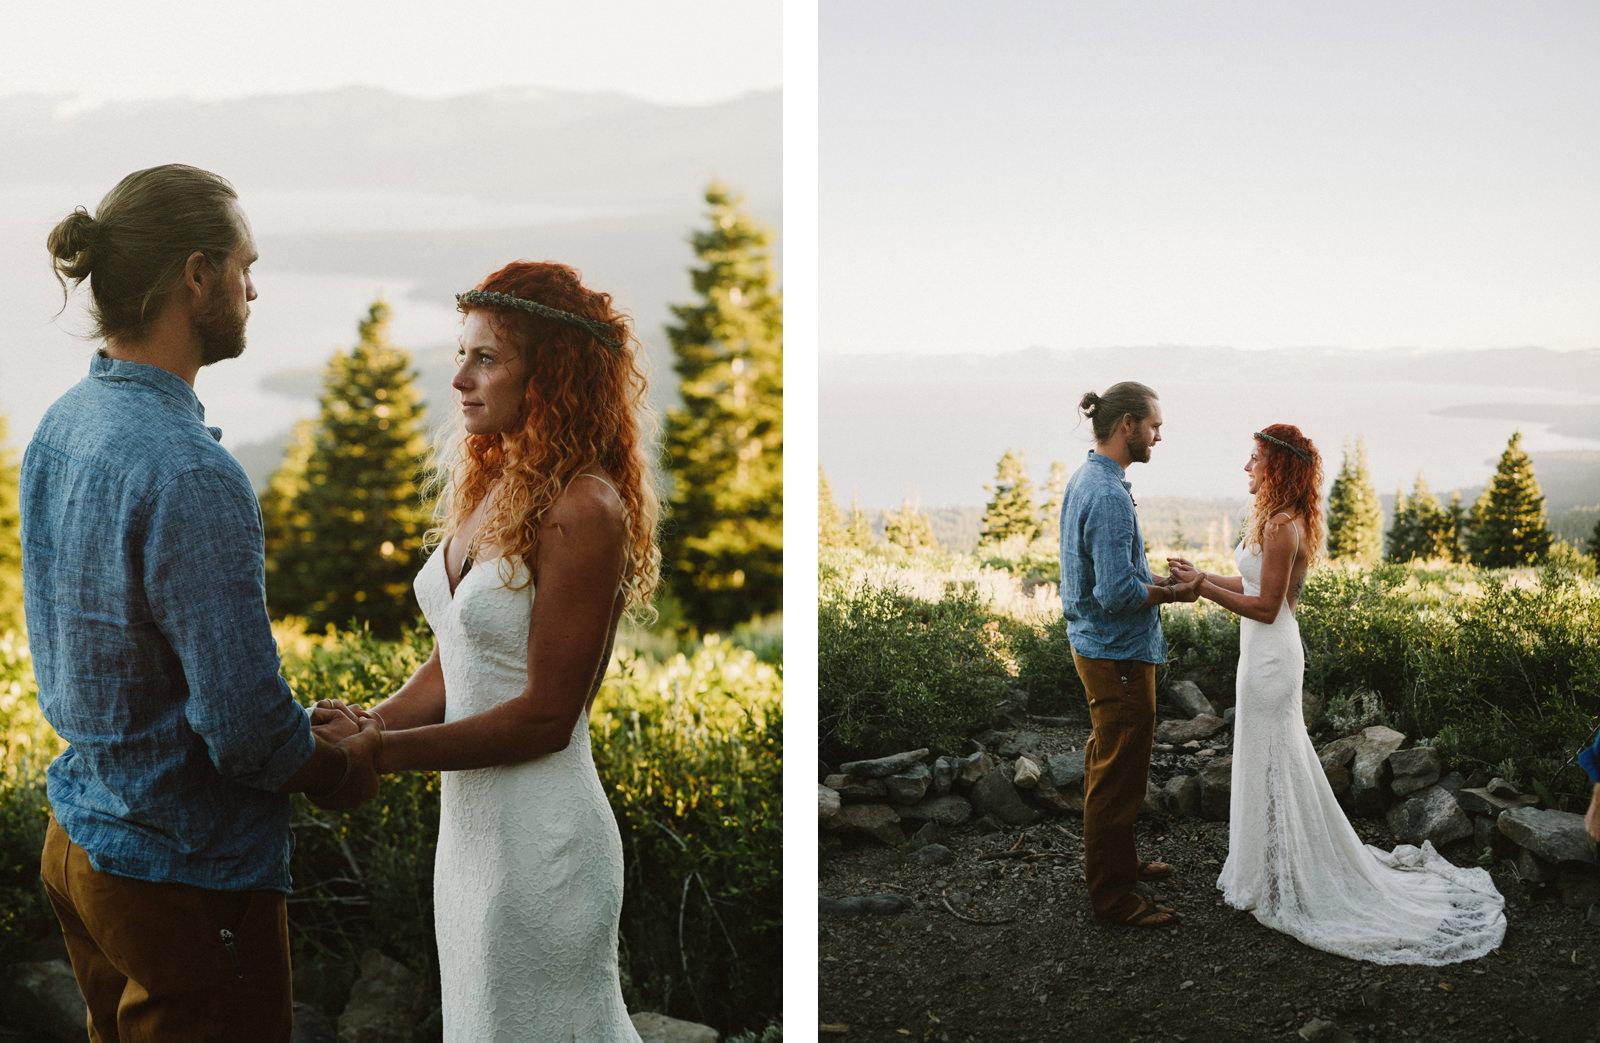 lake-tahoe-elopement-083 LAKE TAHOE ELOPEMENT